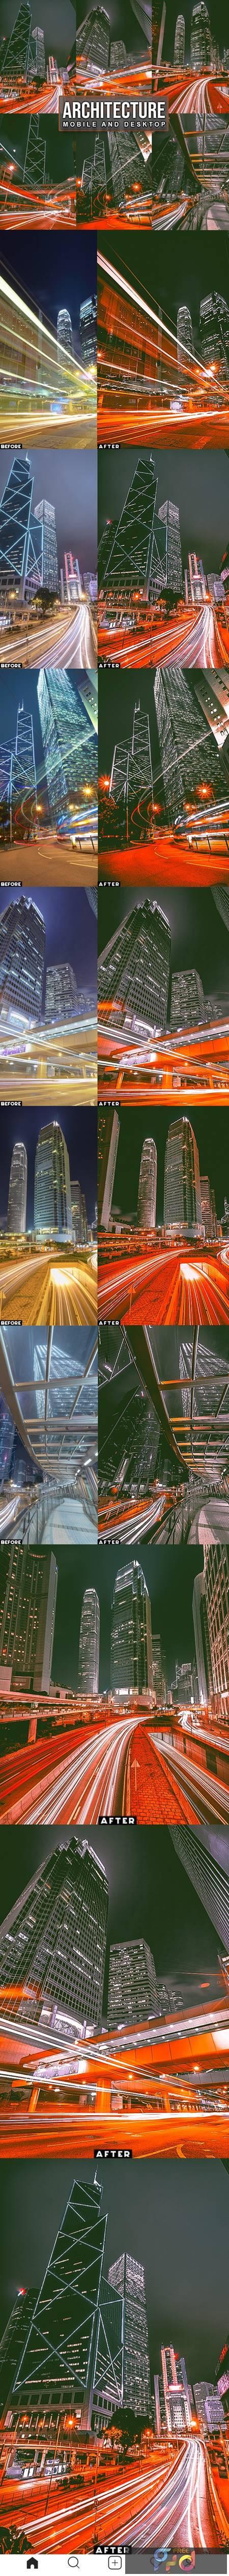 Urban Architecture Lightroom Presets 28673349 1